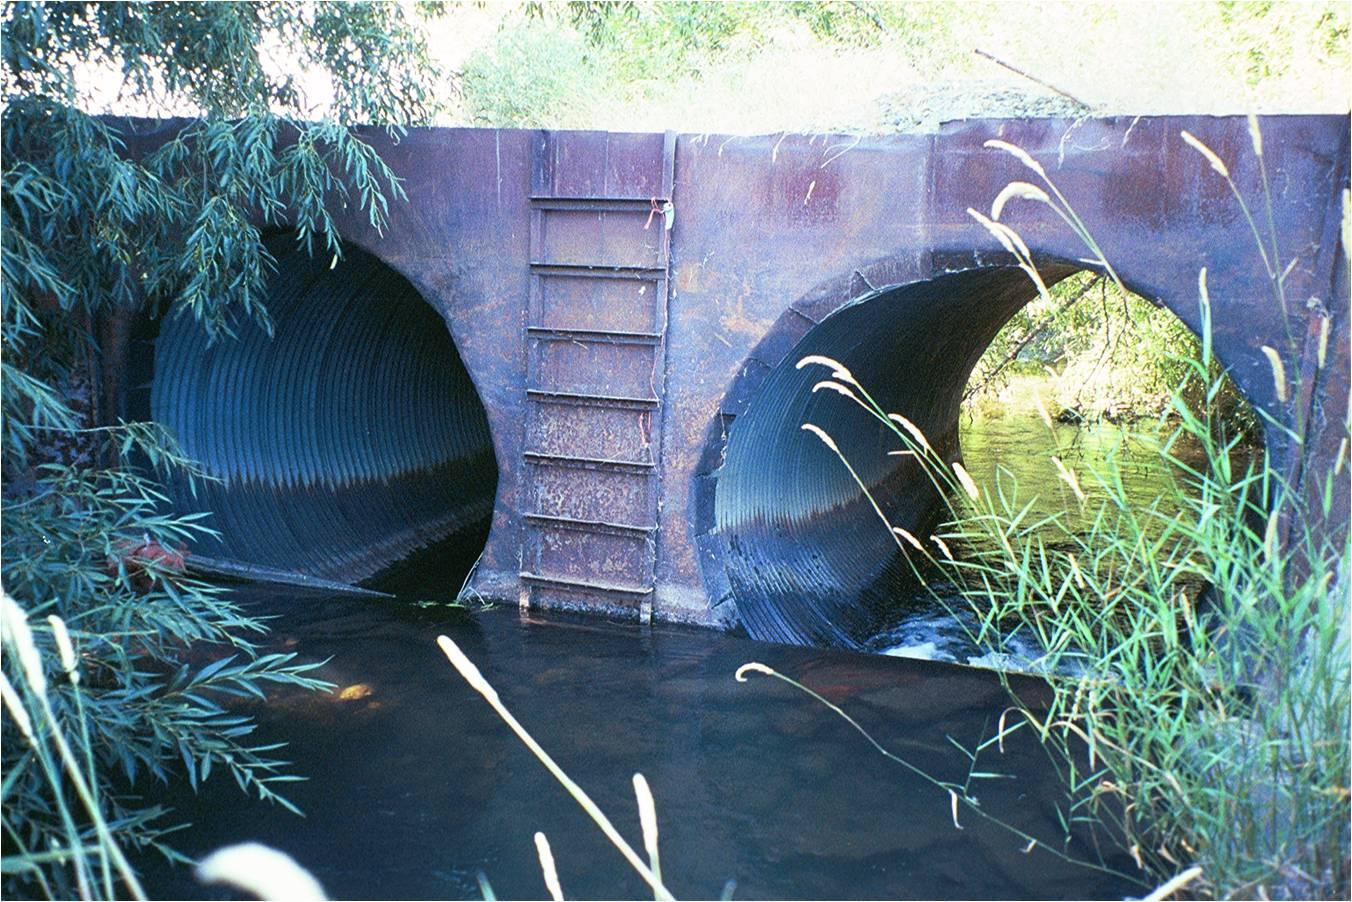 Original Irrigation Structure